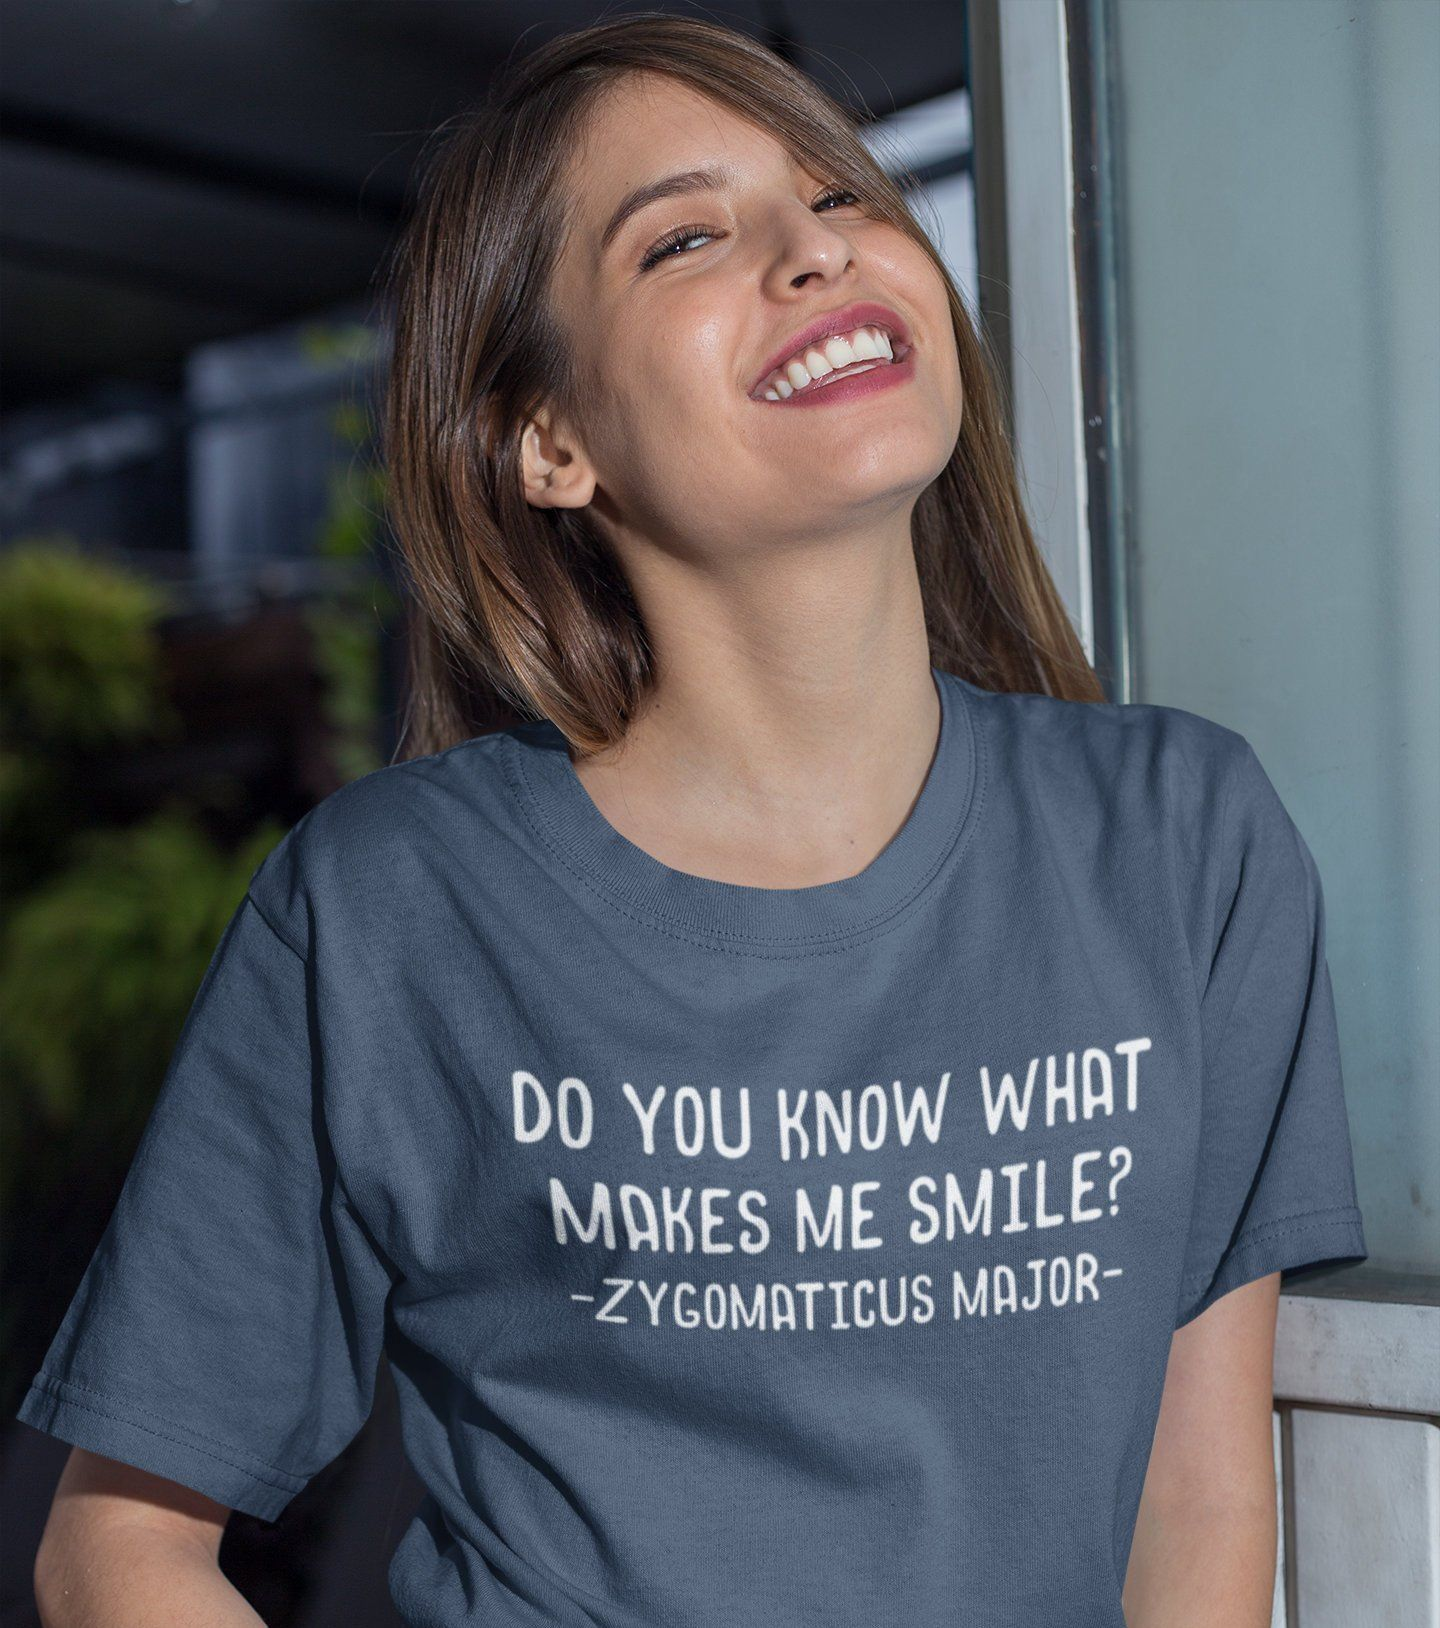 Do you know what makes me smile? zygomaticus major, dental